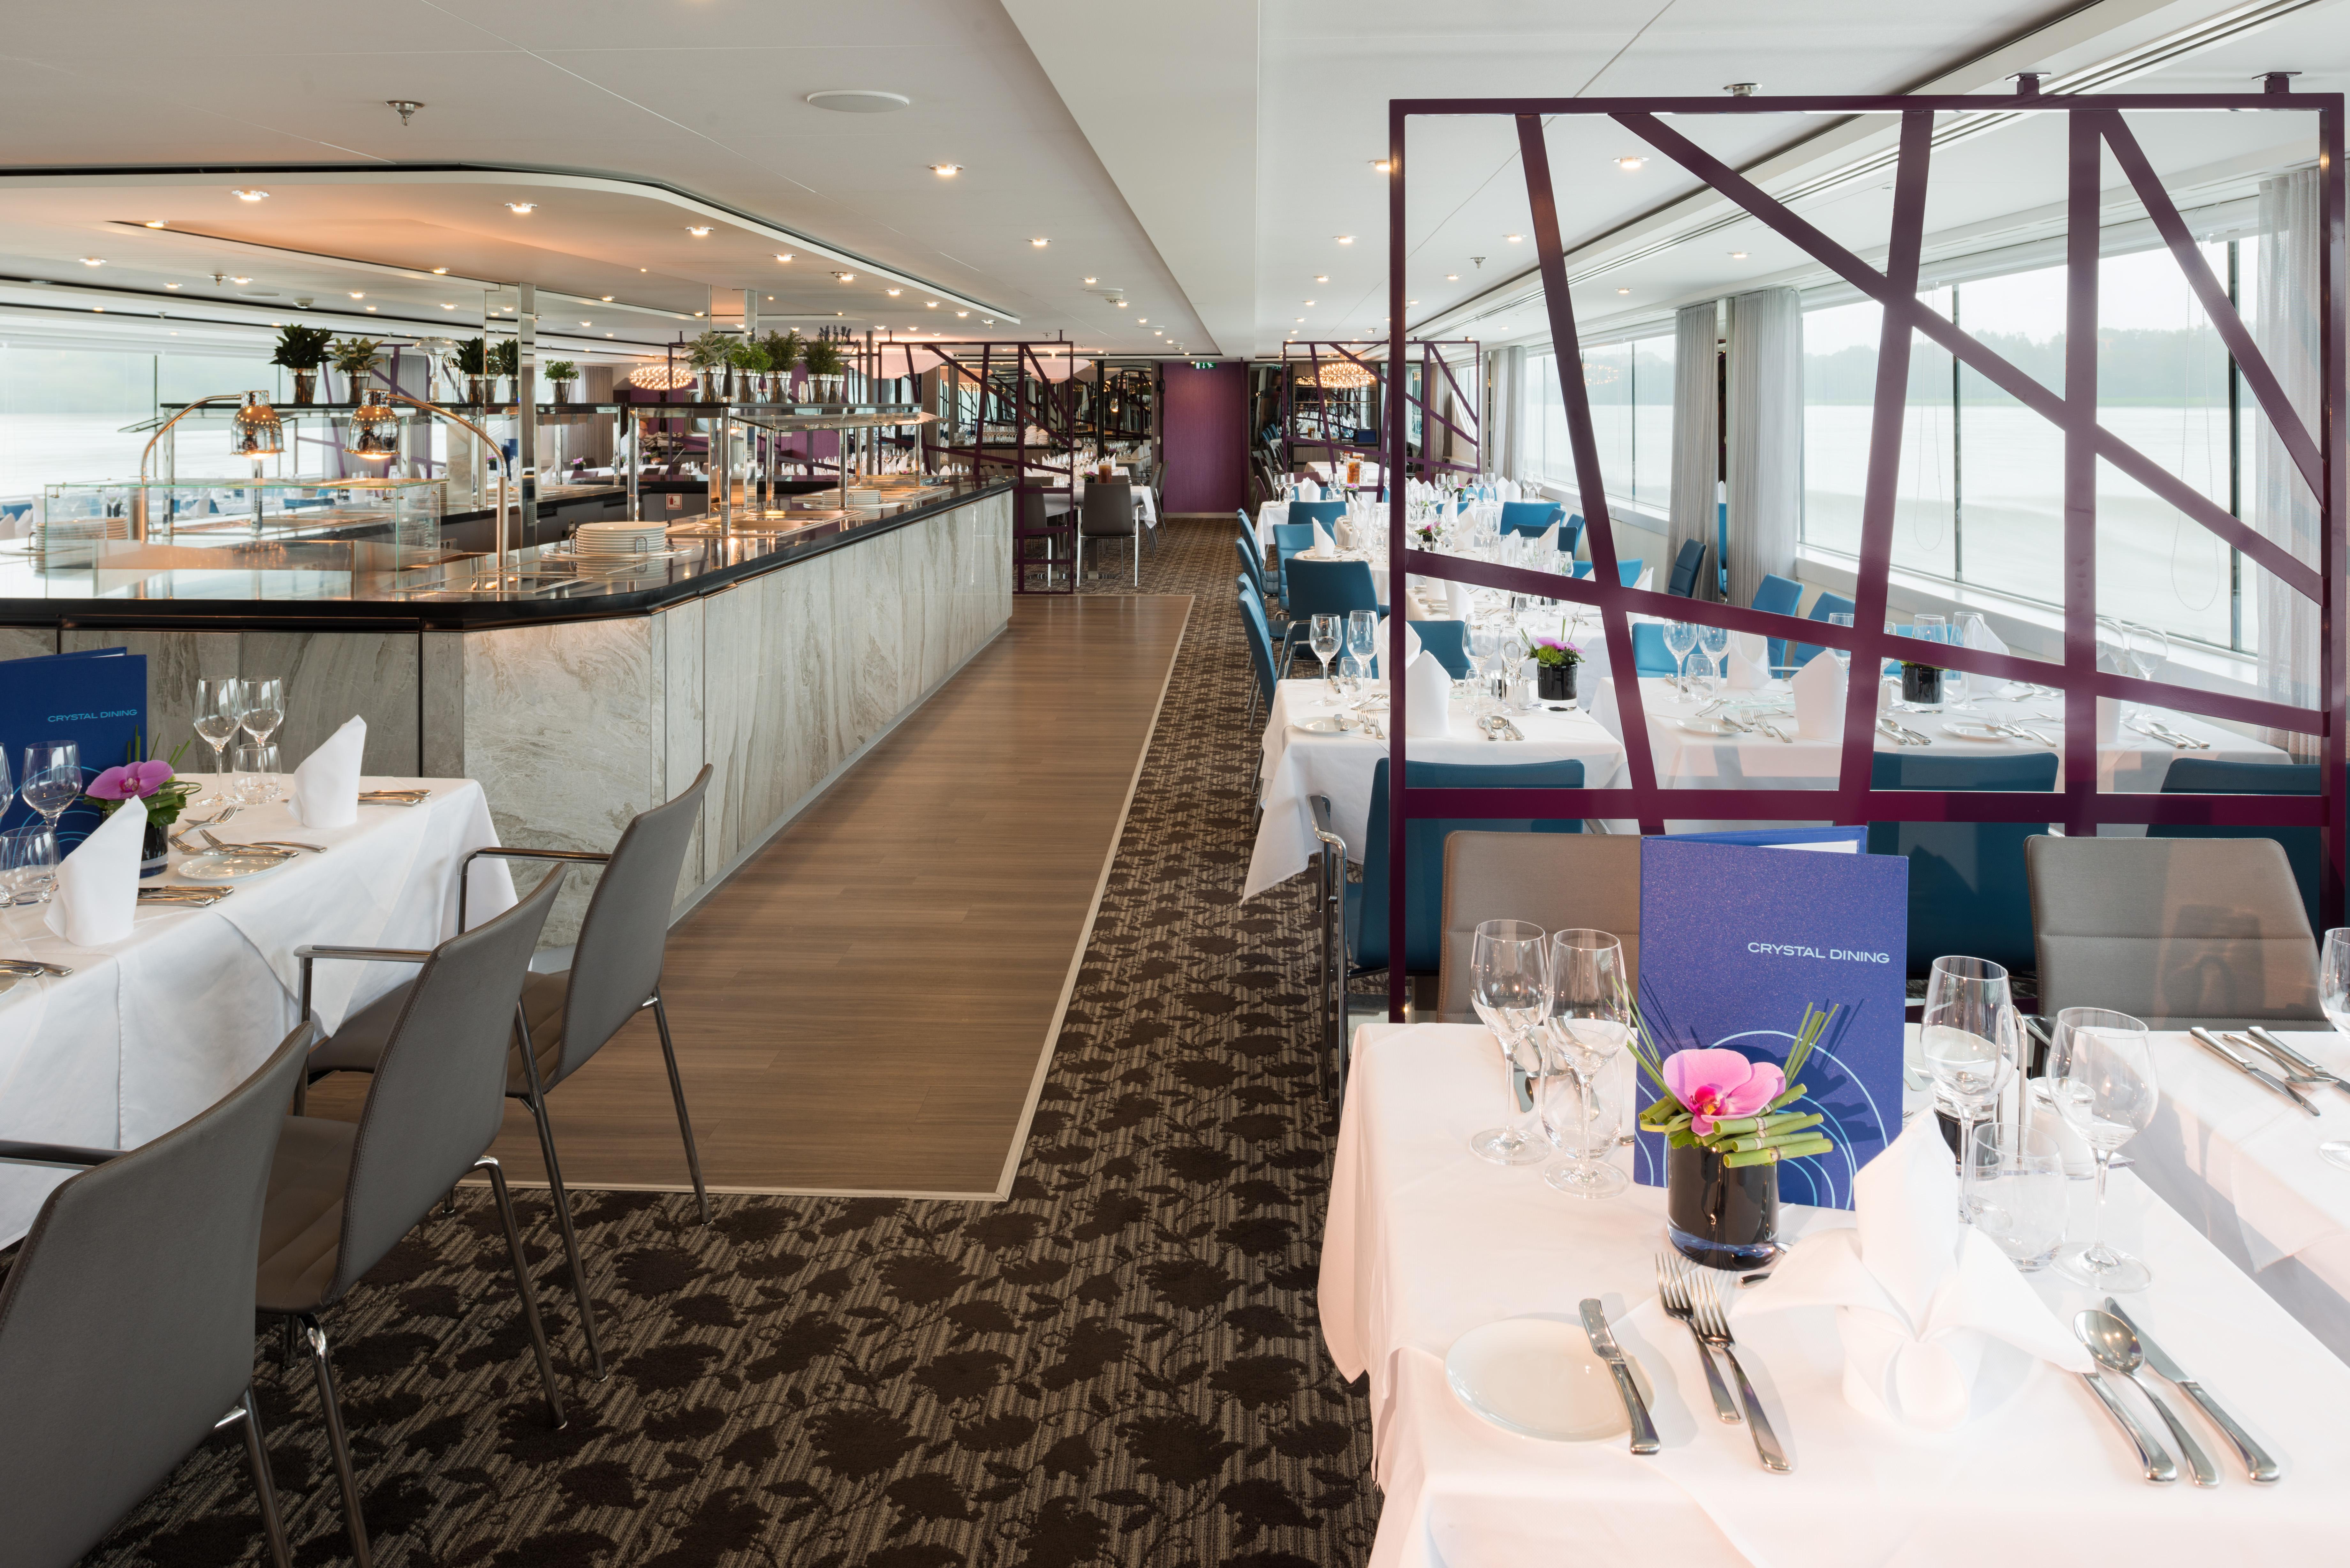 Scenic Crystal Scenic Jewel Scenic Jade Interior Crystal Dining Restaurant 3.jpg